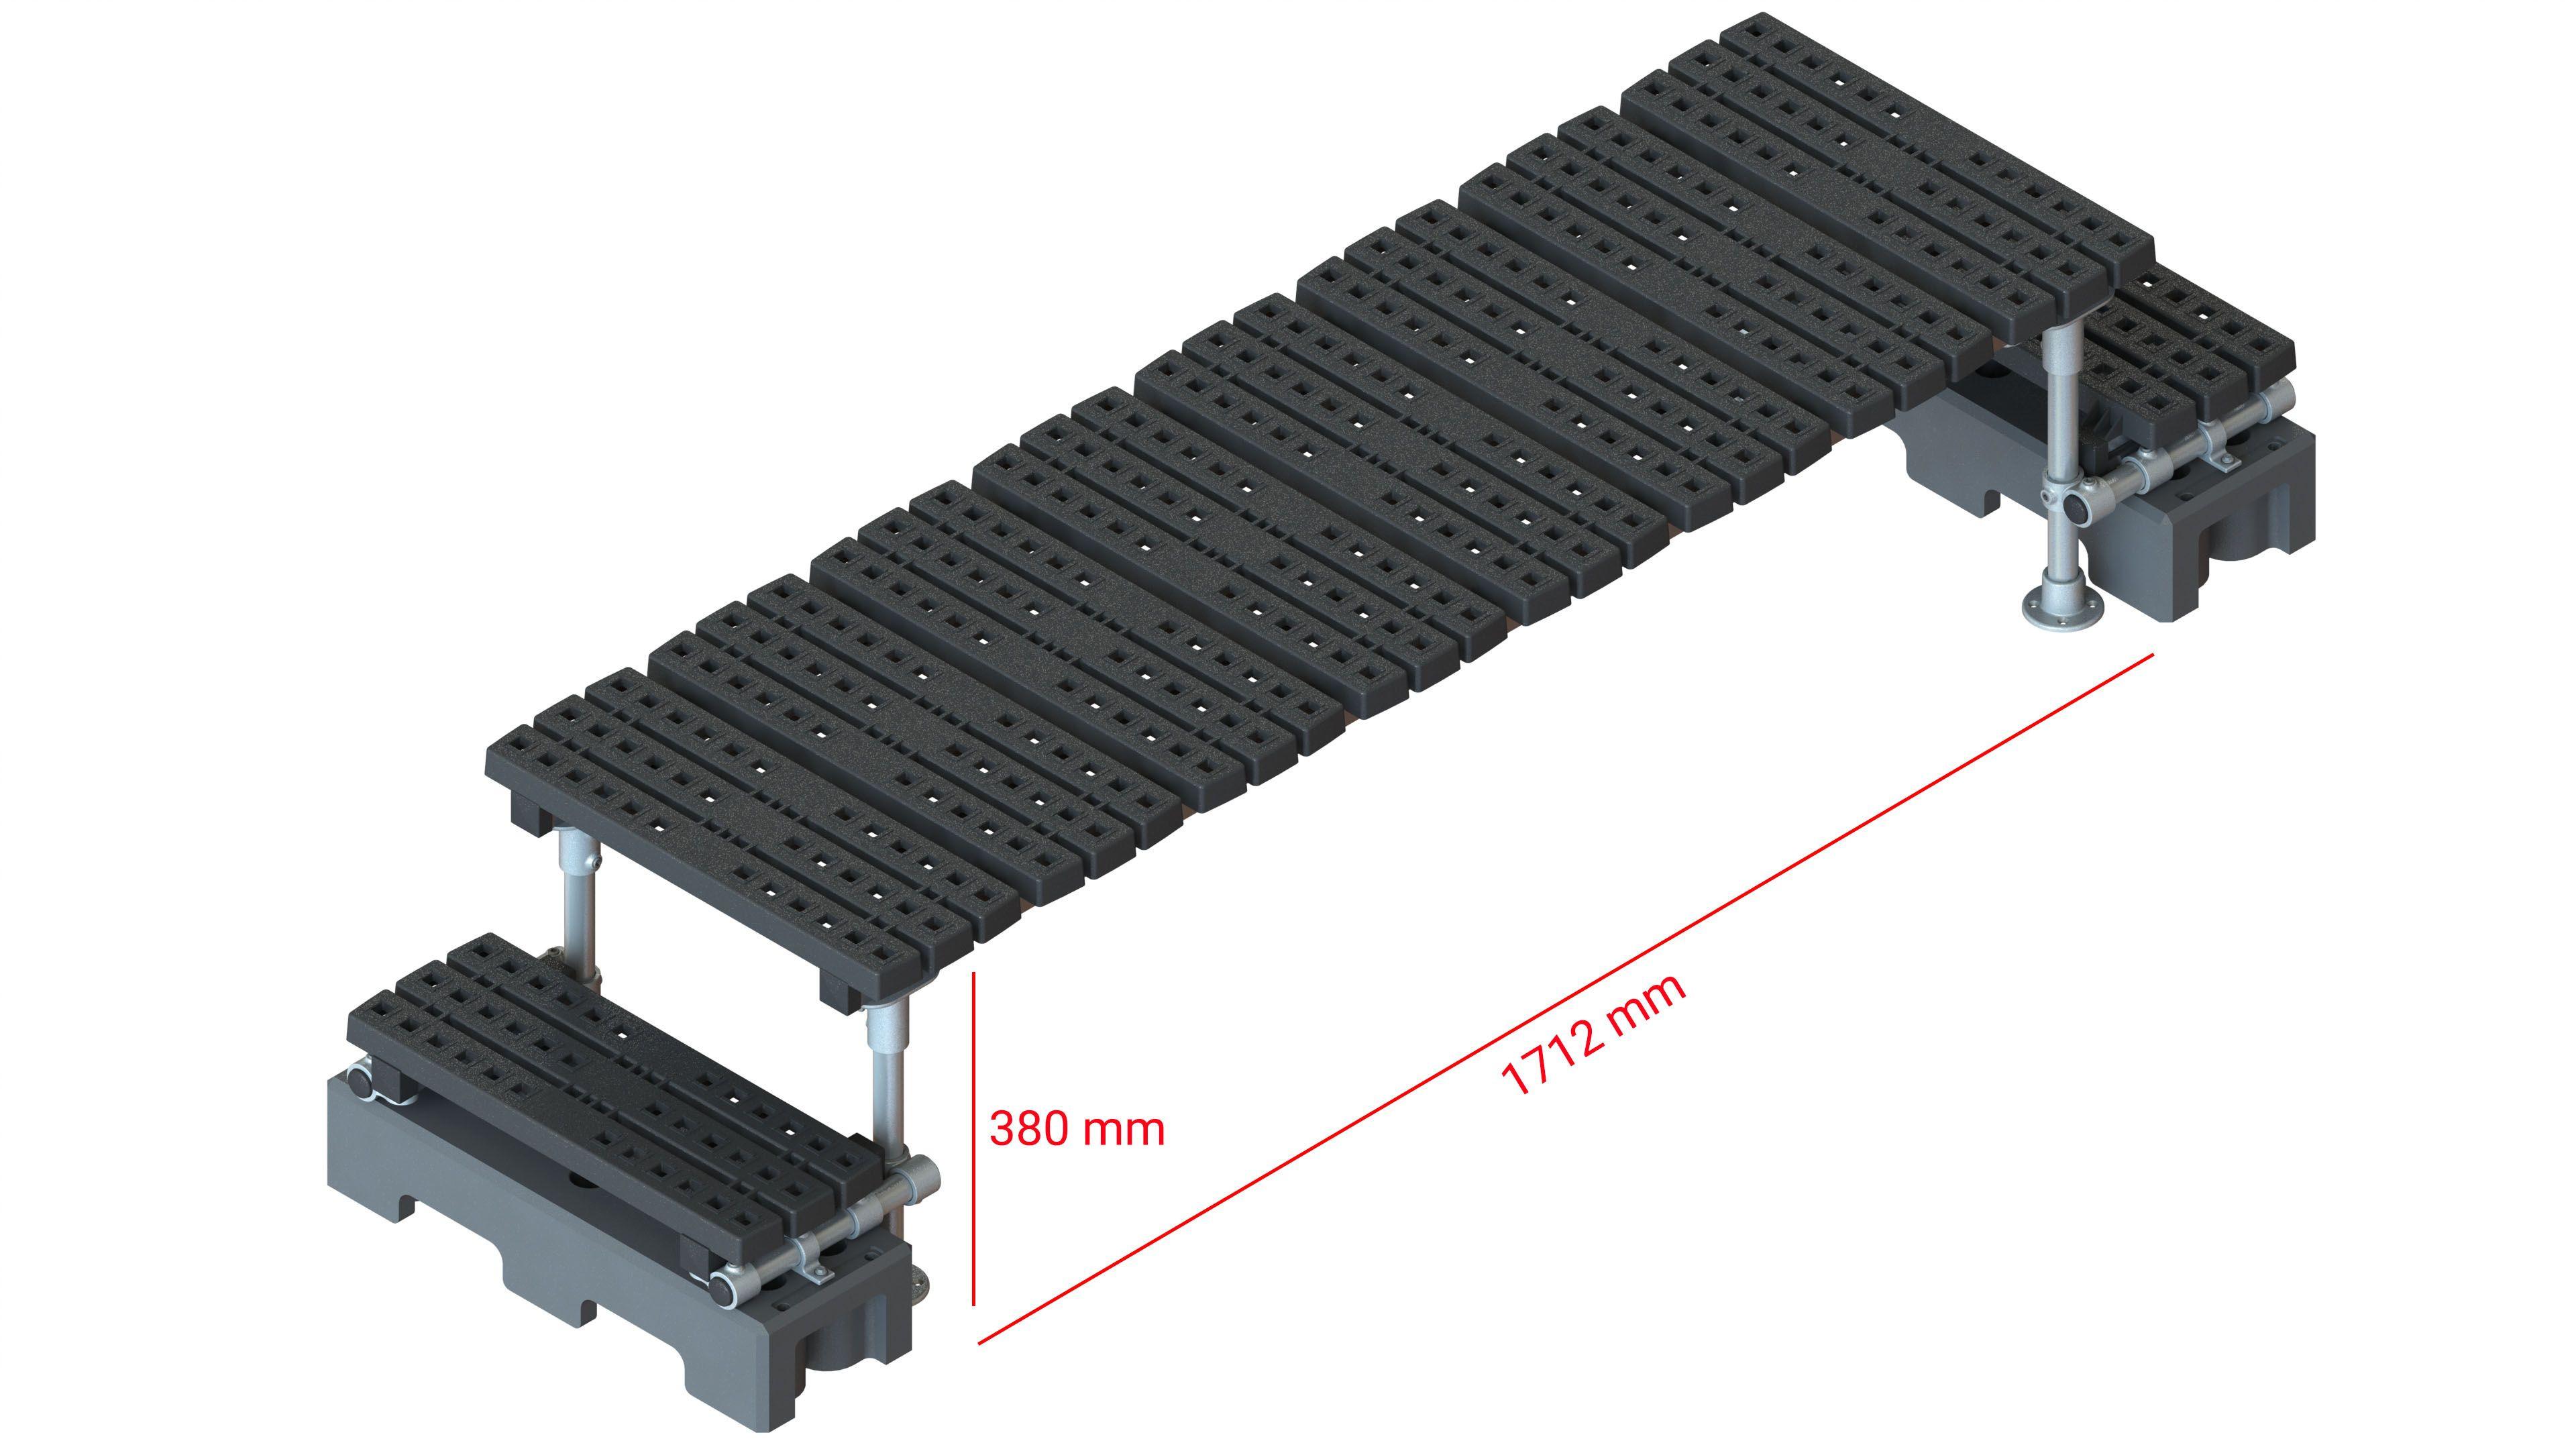 Mini step-over platform - Freestanding, 380x1712mm clearance